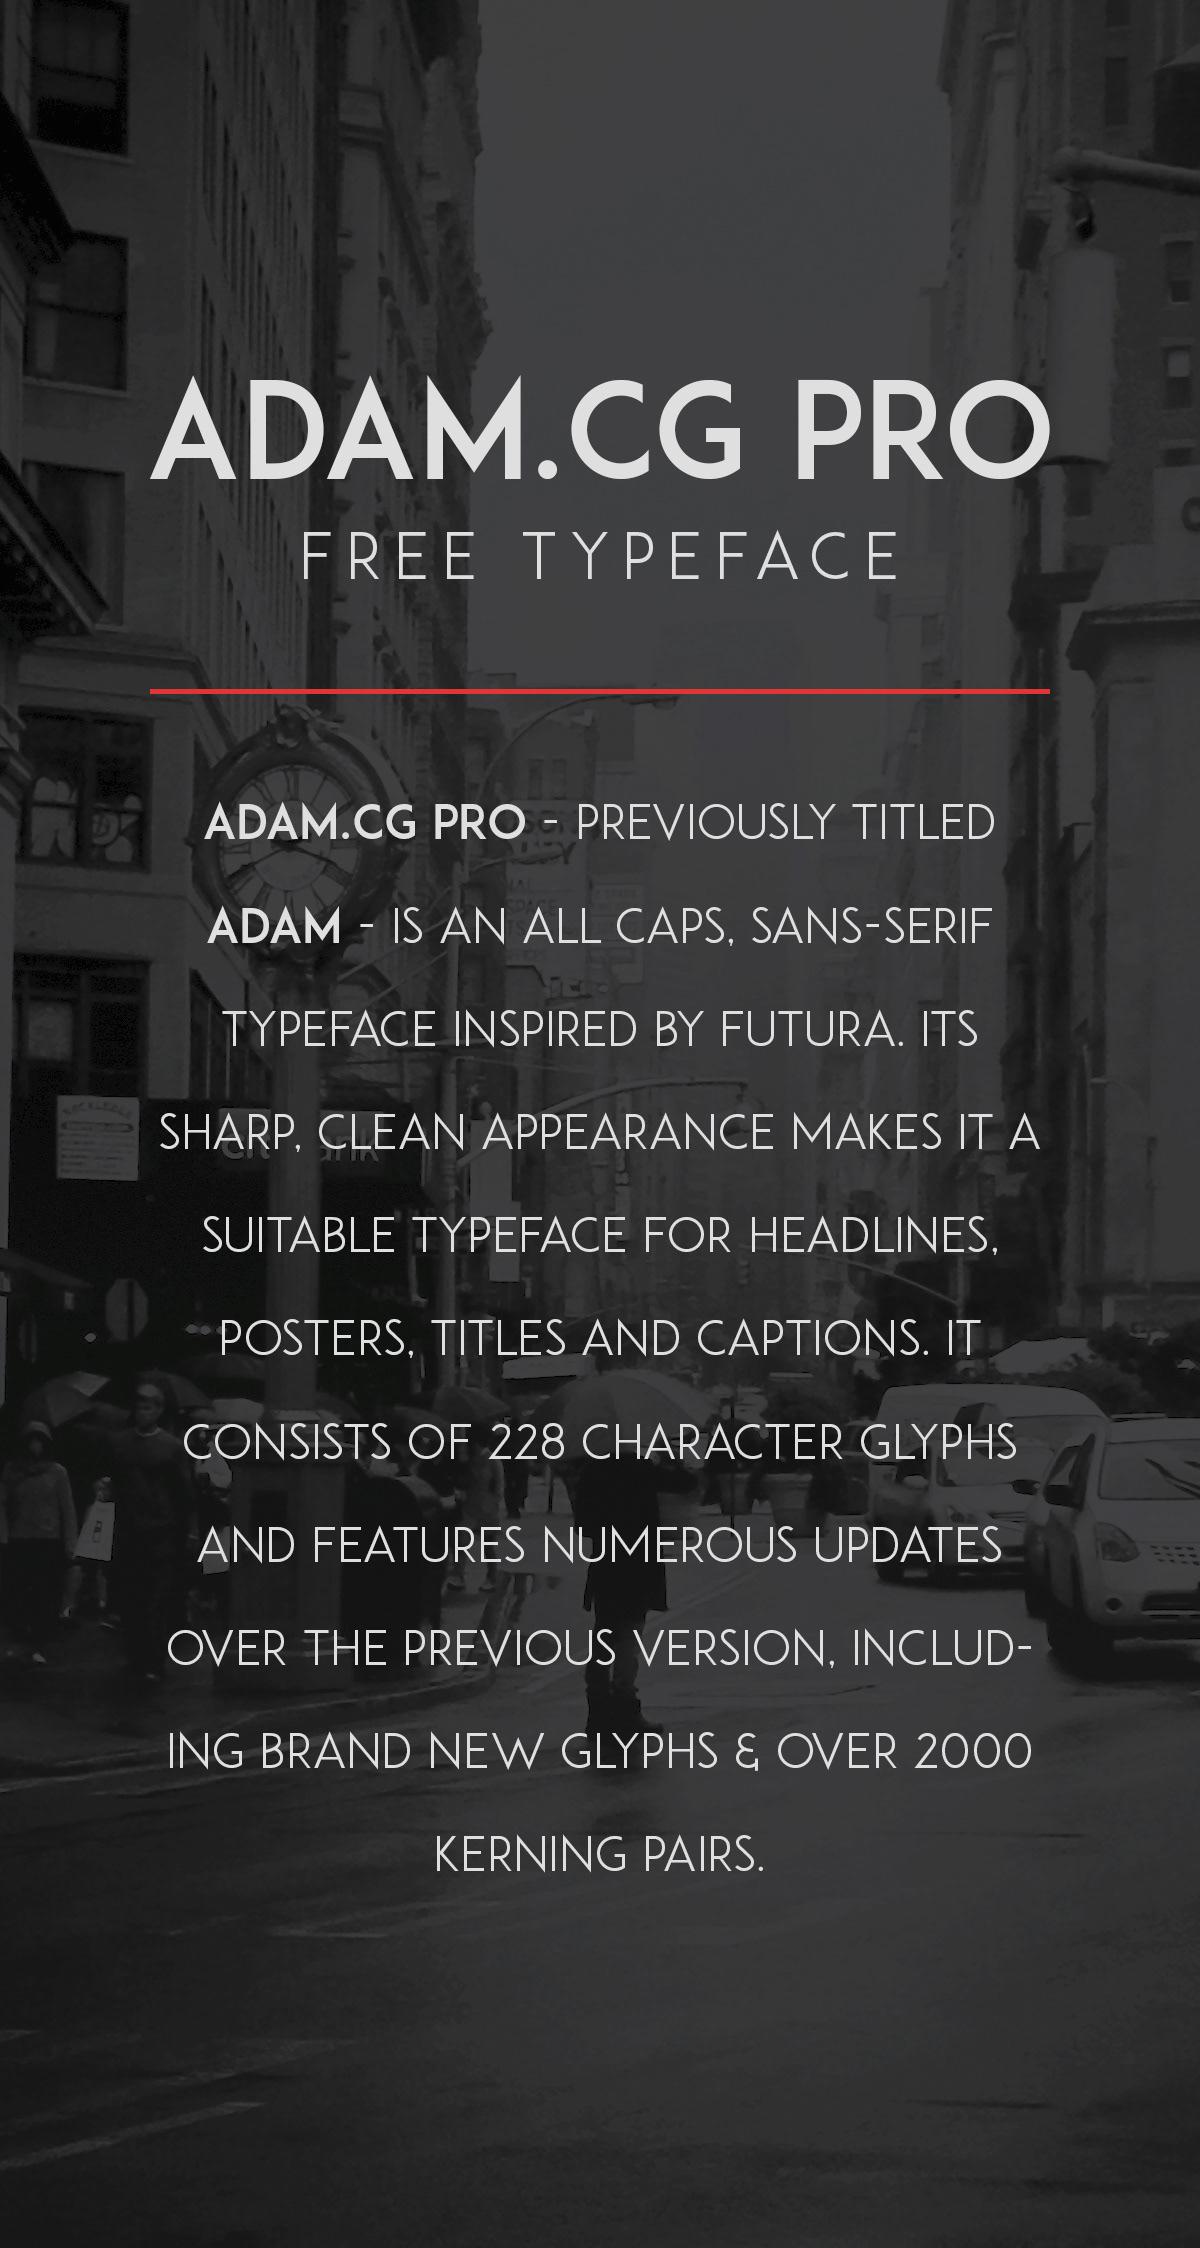 ADAM.CG PRO Font Download